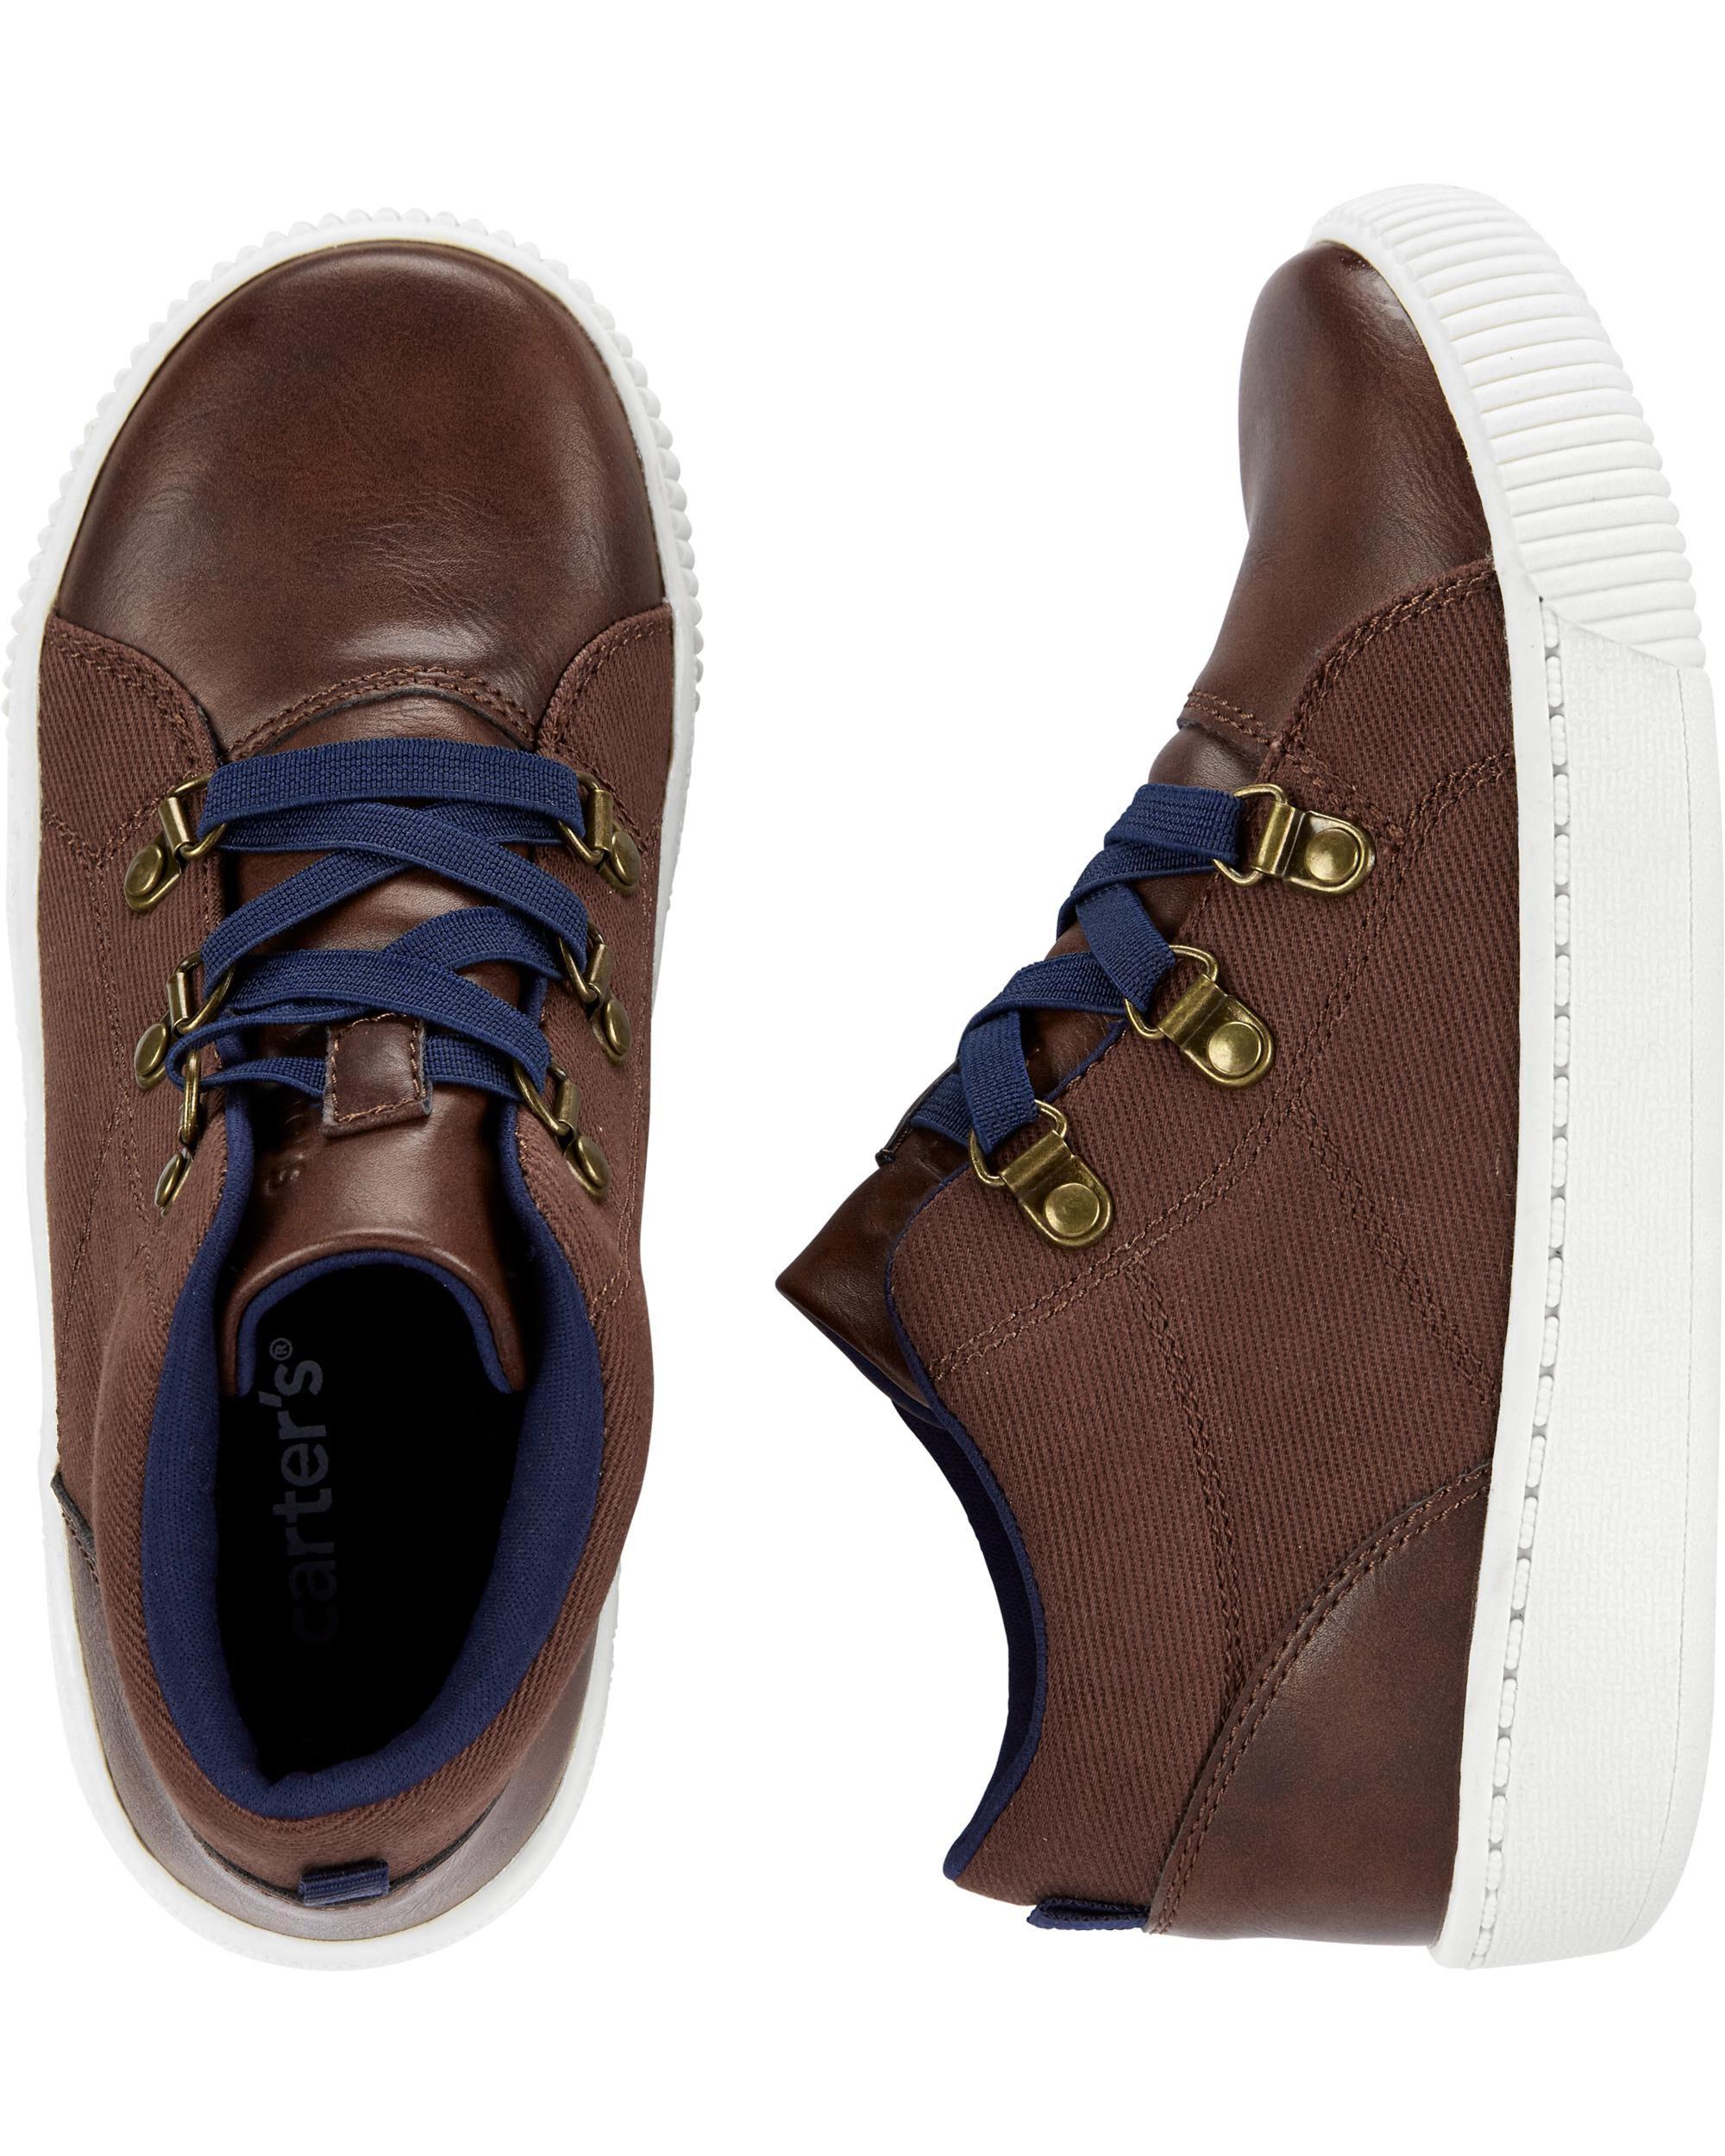 Oshkoshbgosh Carters High Top Sneakers